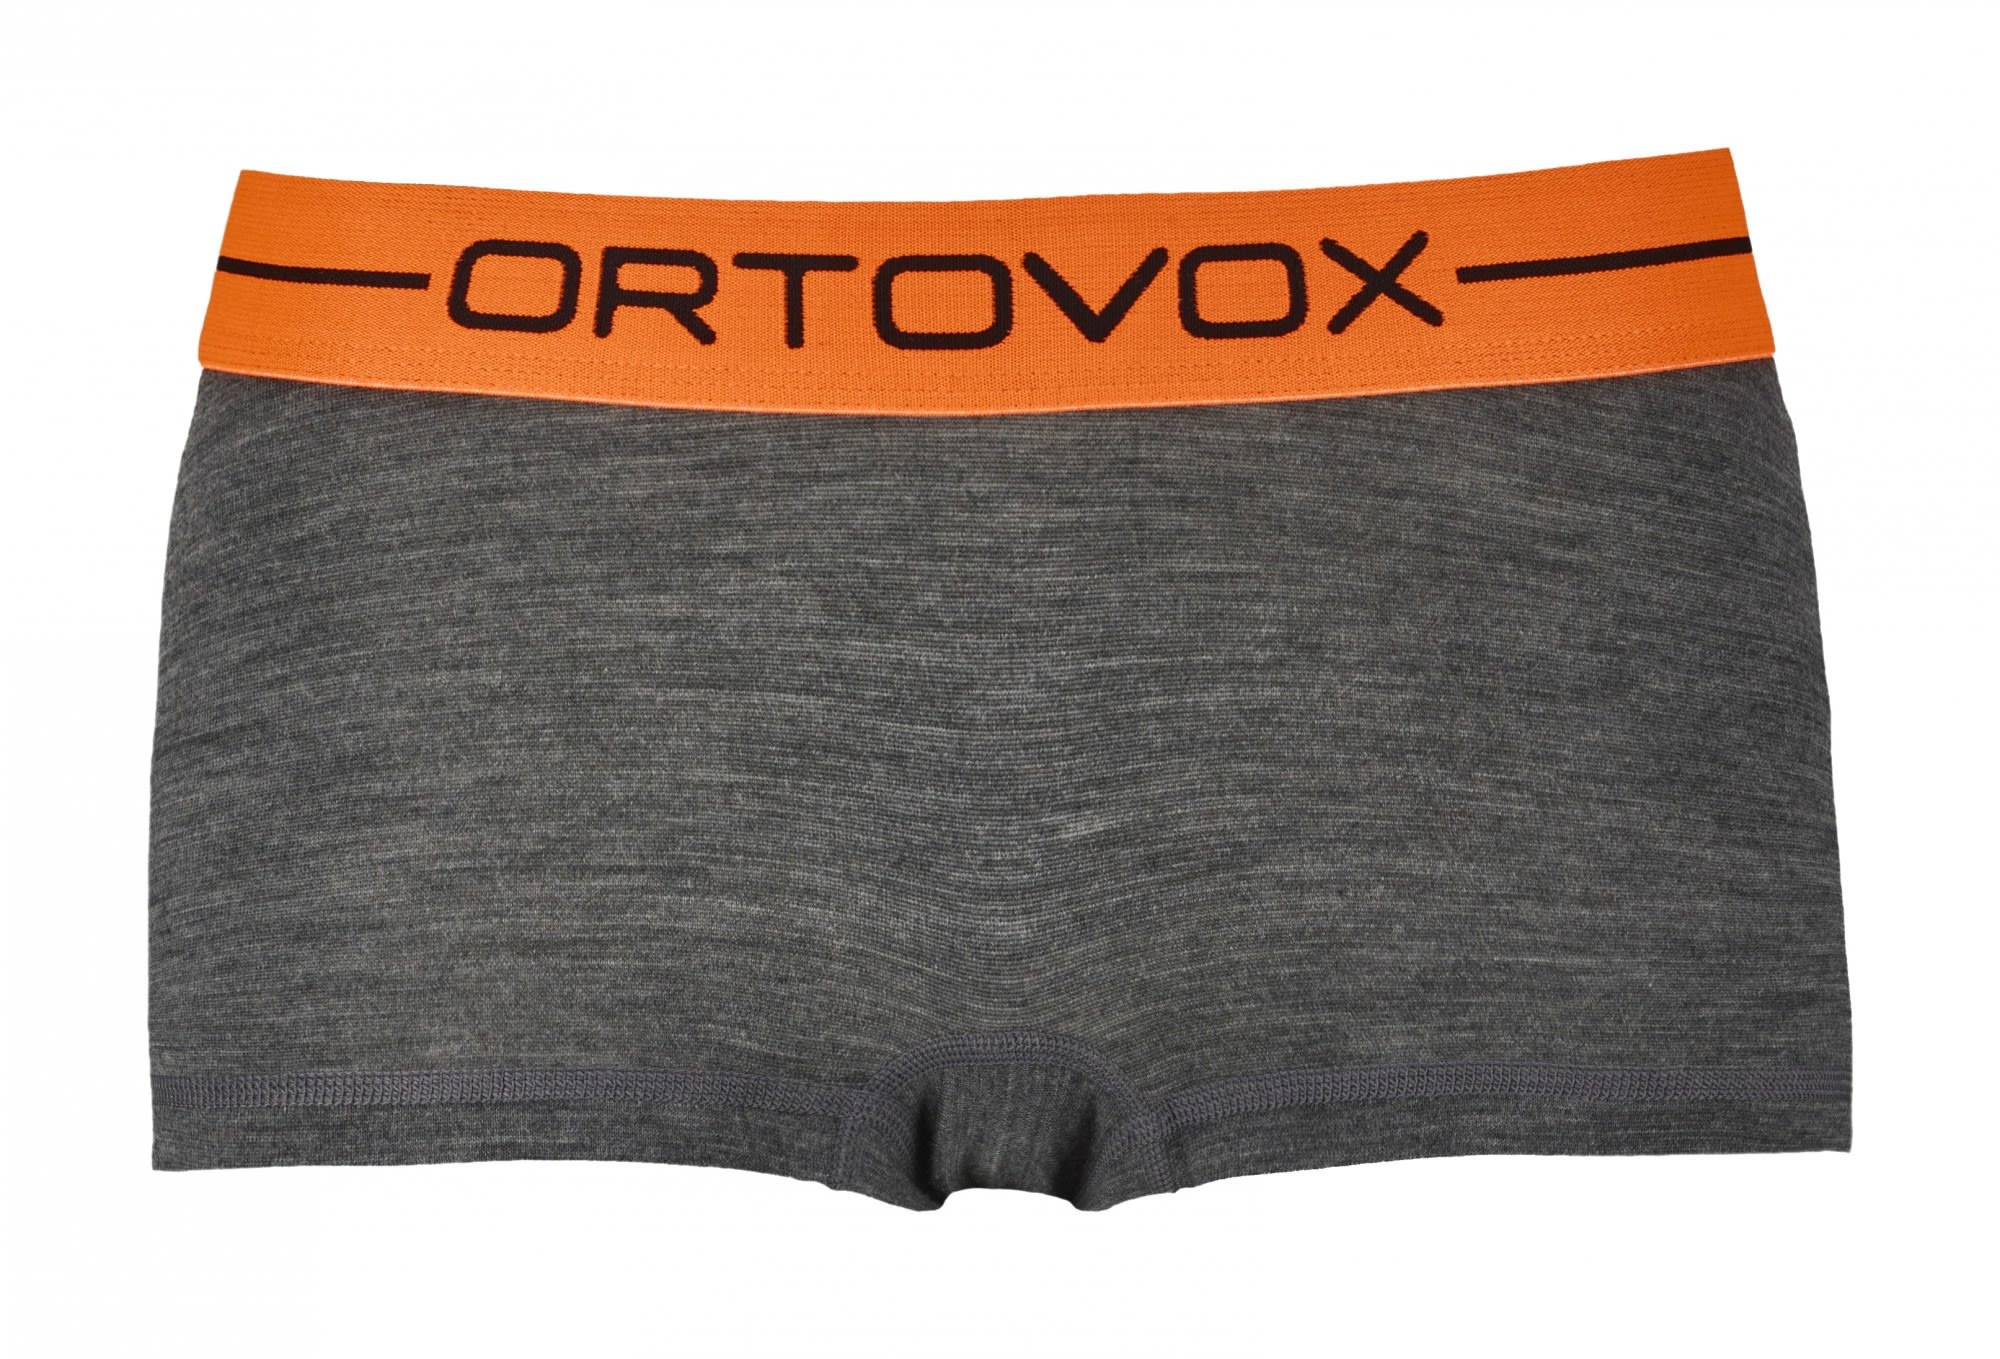 Ortovox 185 Merino Rock'n'wool Hot Pants Grau, Female Merino Unterwäsche, M